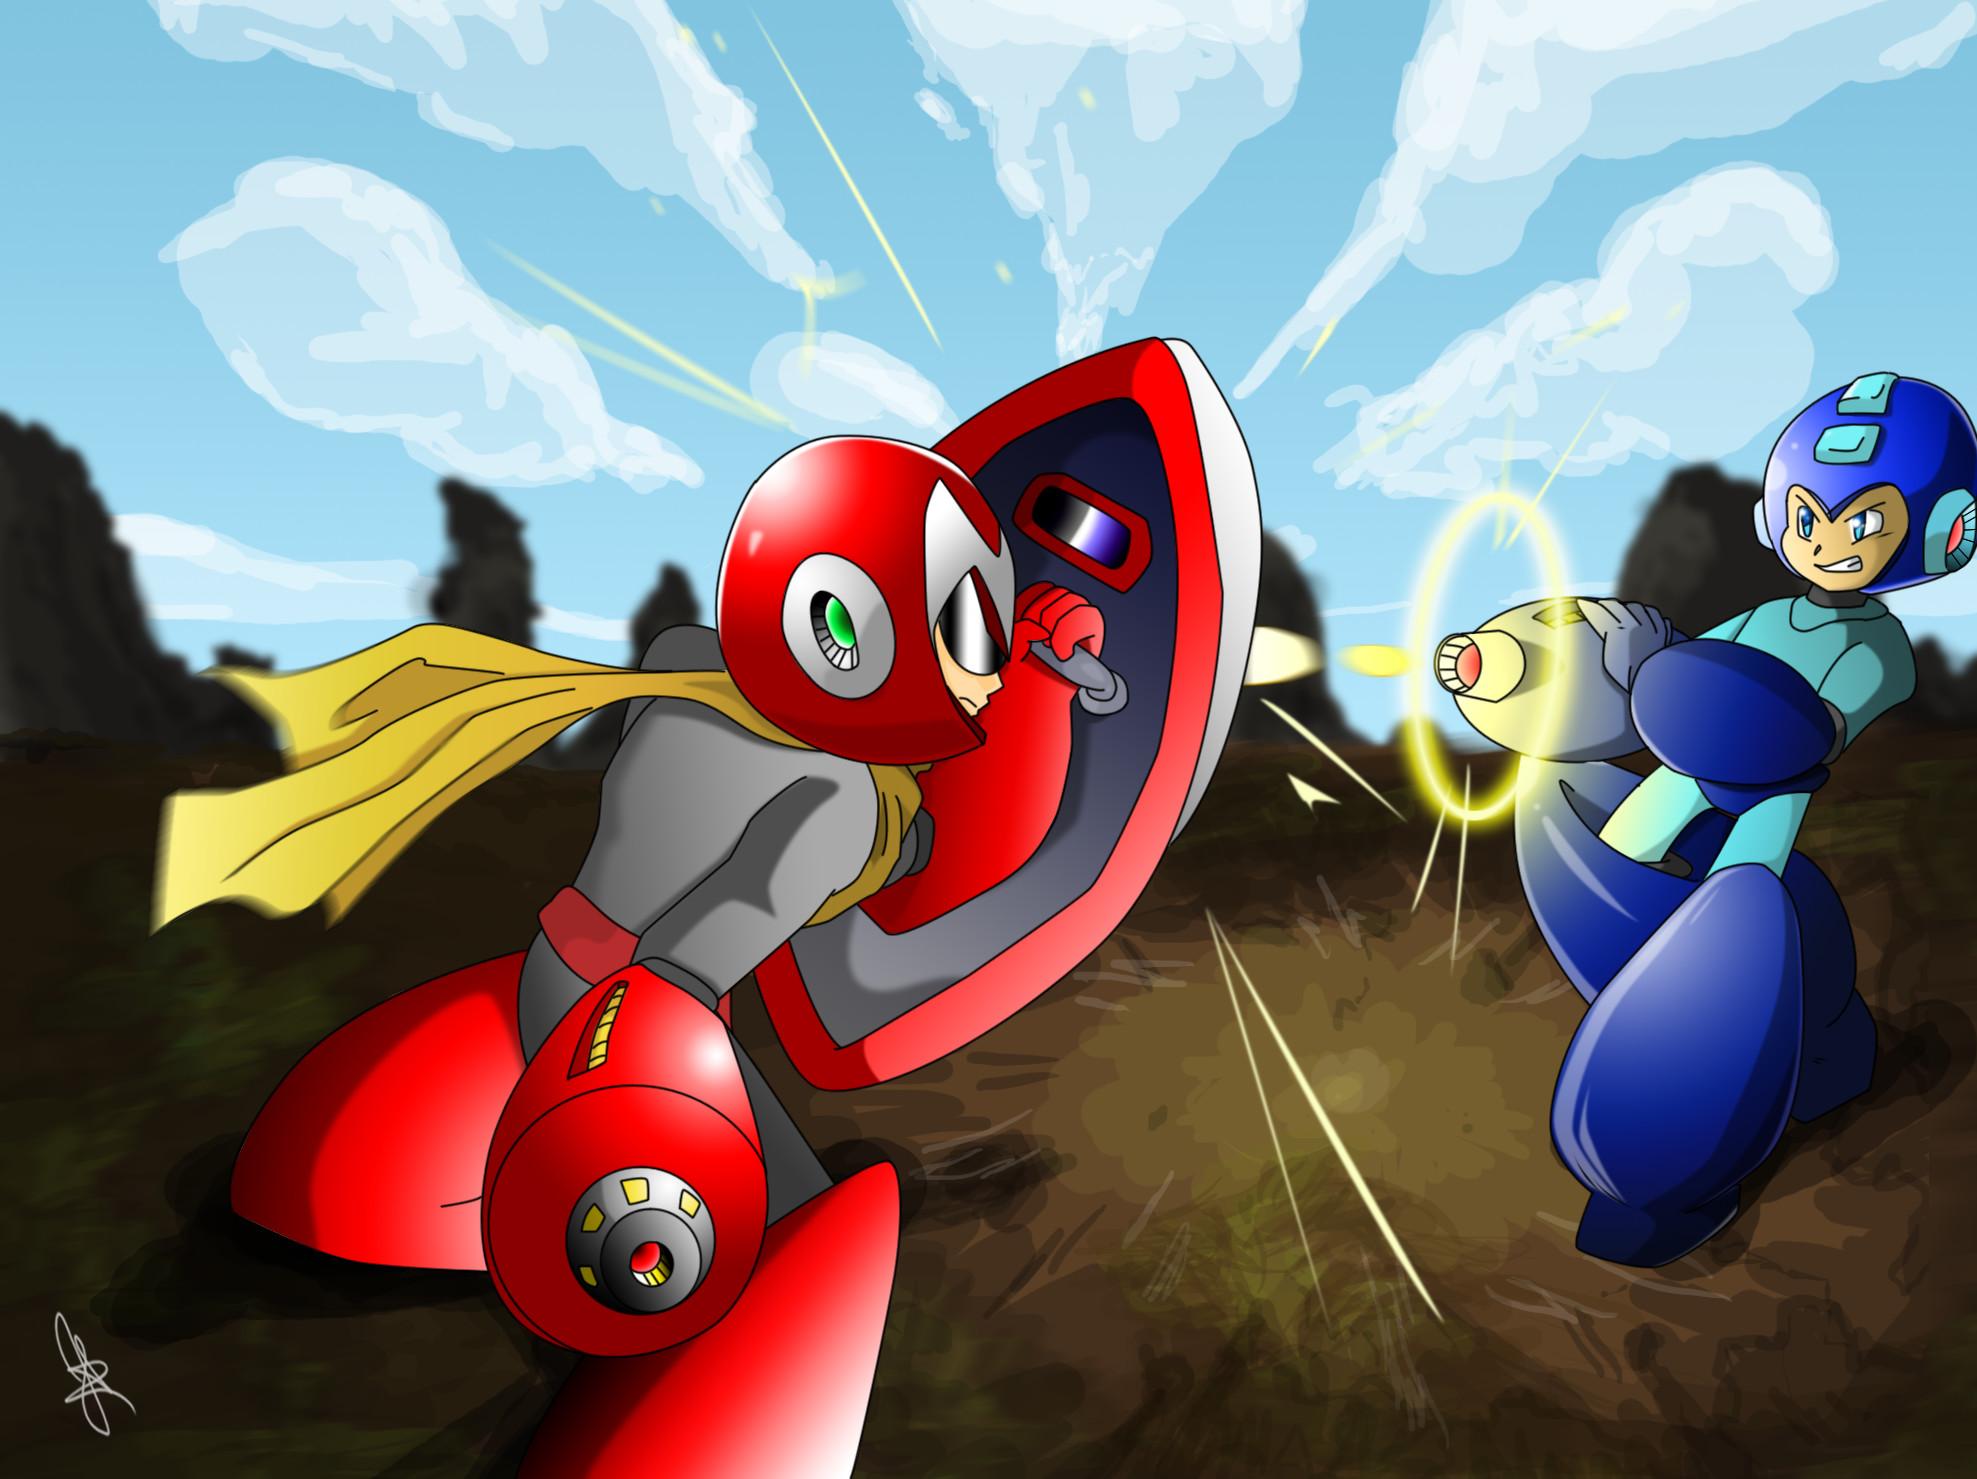 Protoman vs Megaman! by exleydragon Protoman vs Megaman! by exleydragon